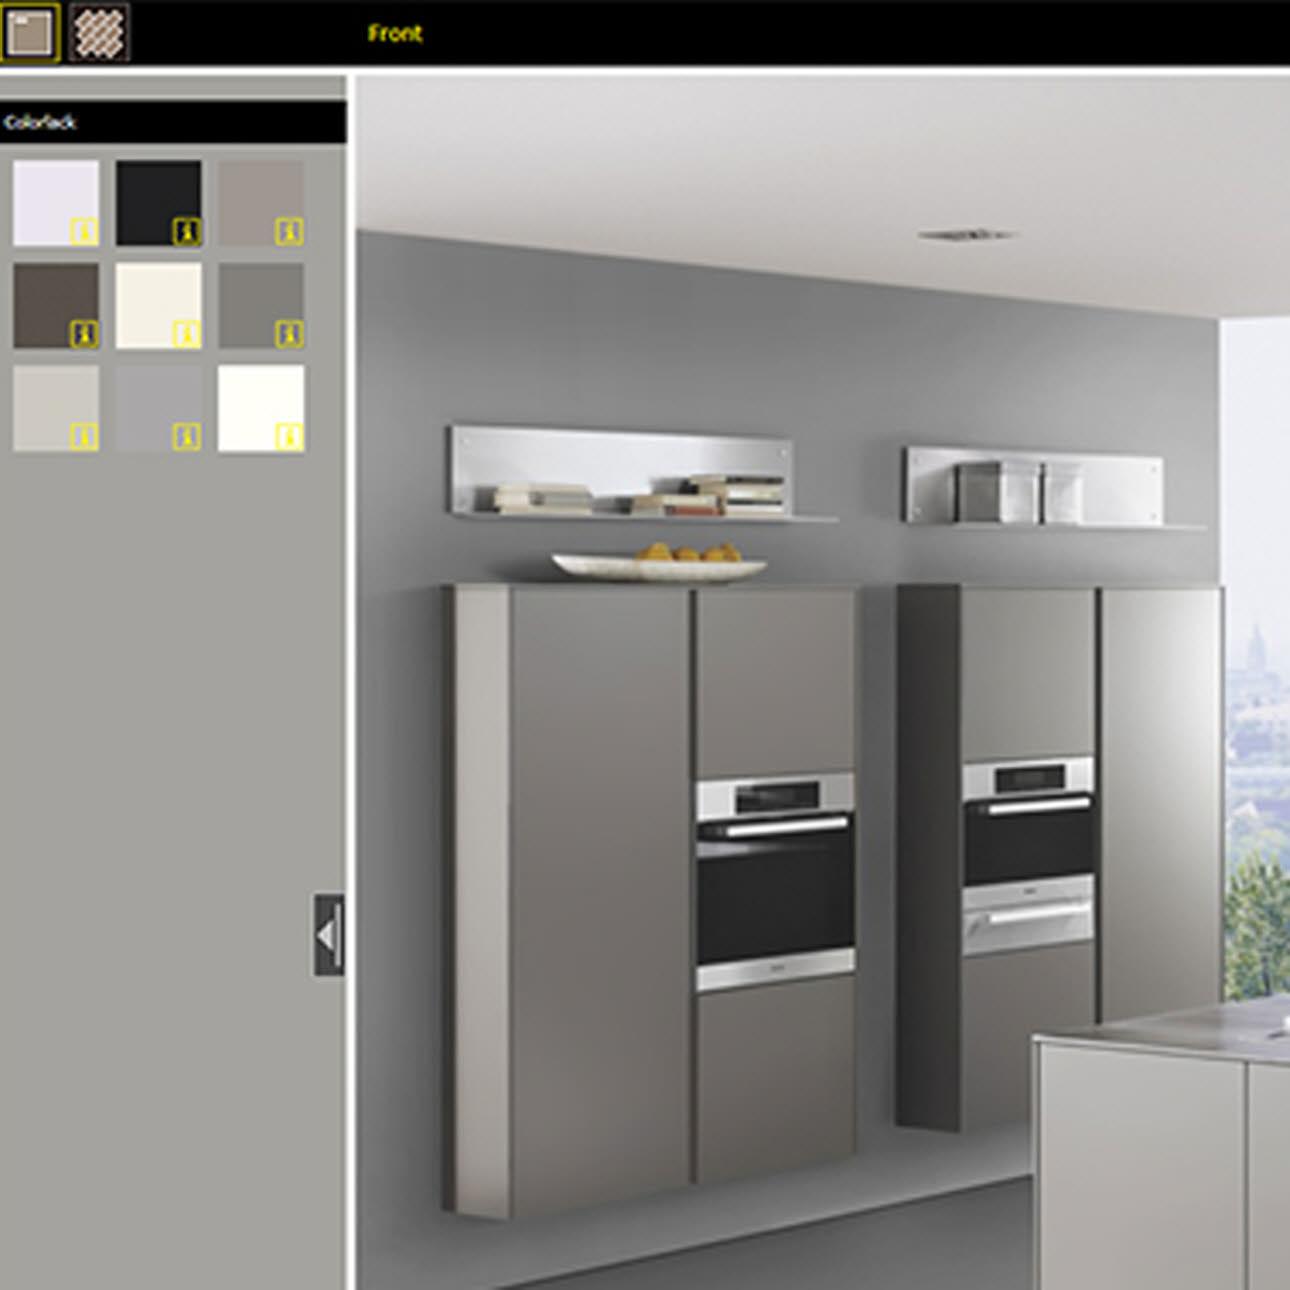 Kuchenkonzepte epizodo personeco intuo for Küchen konfigurator